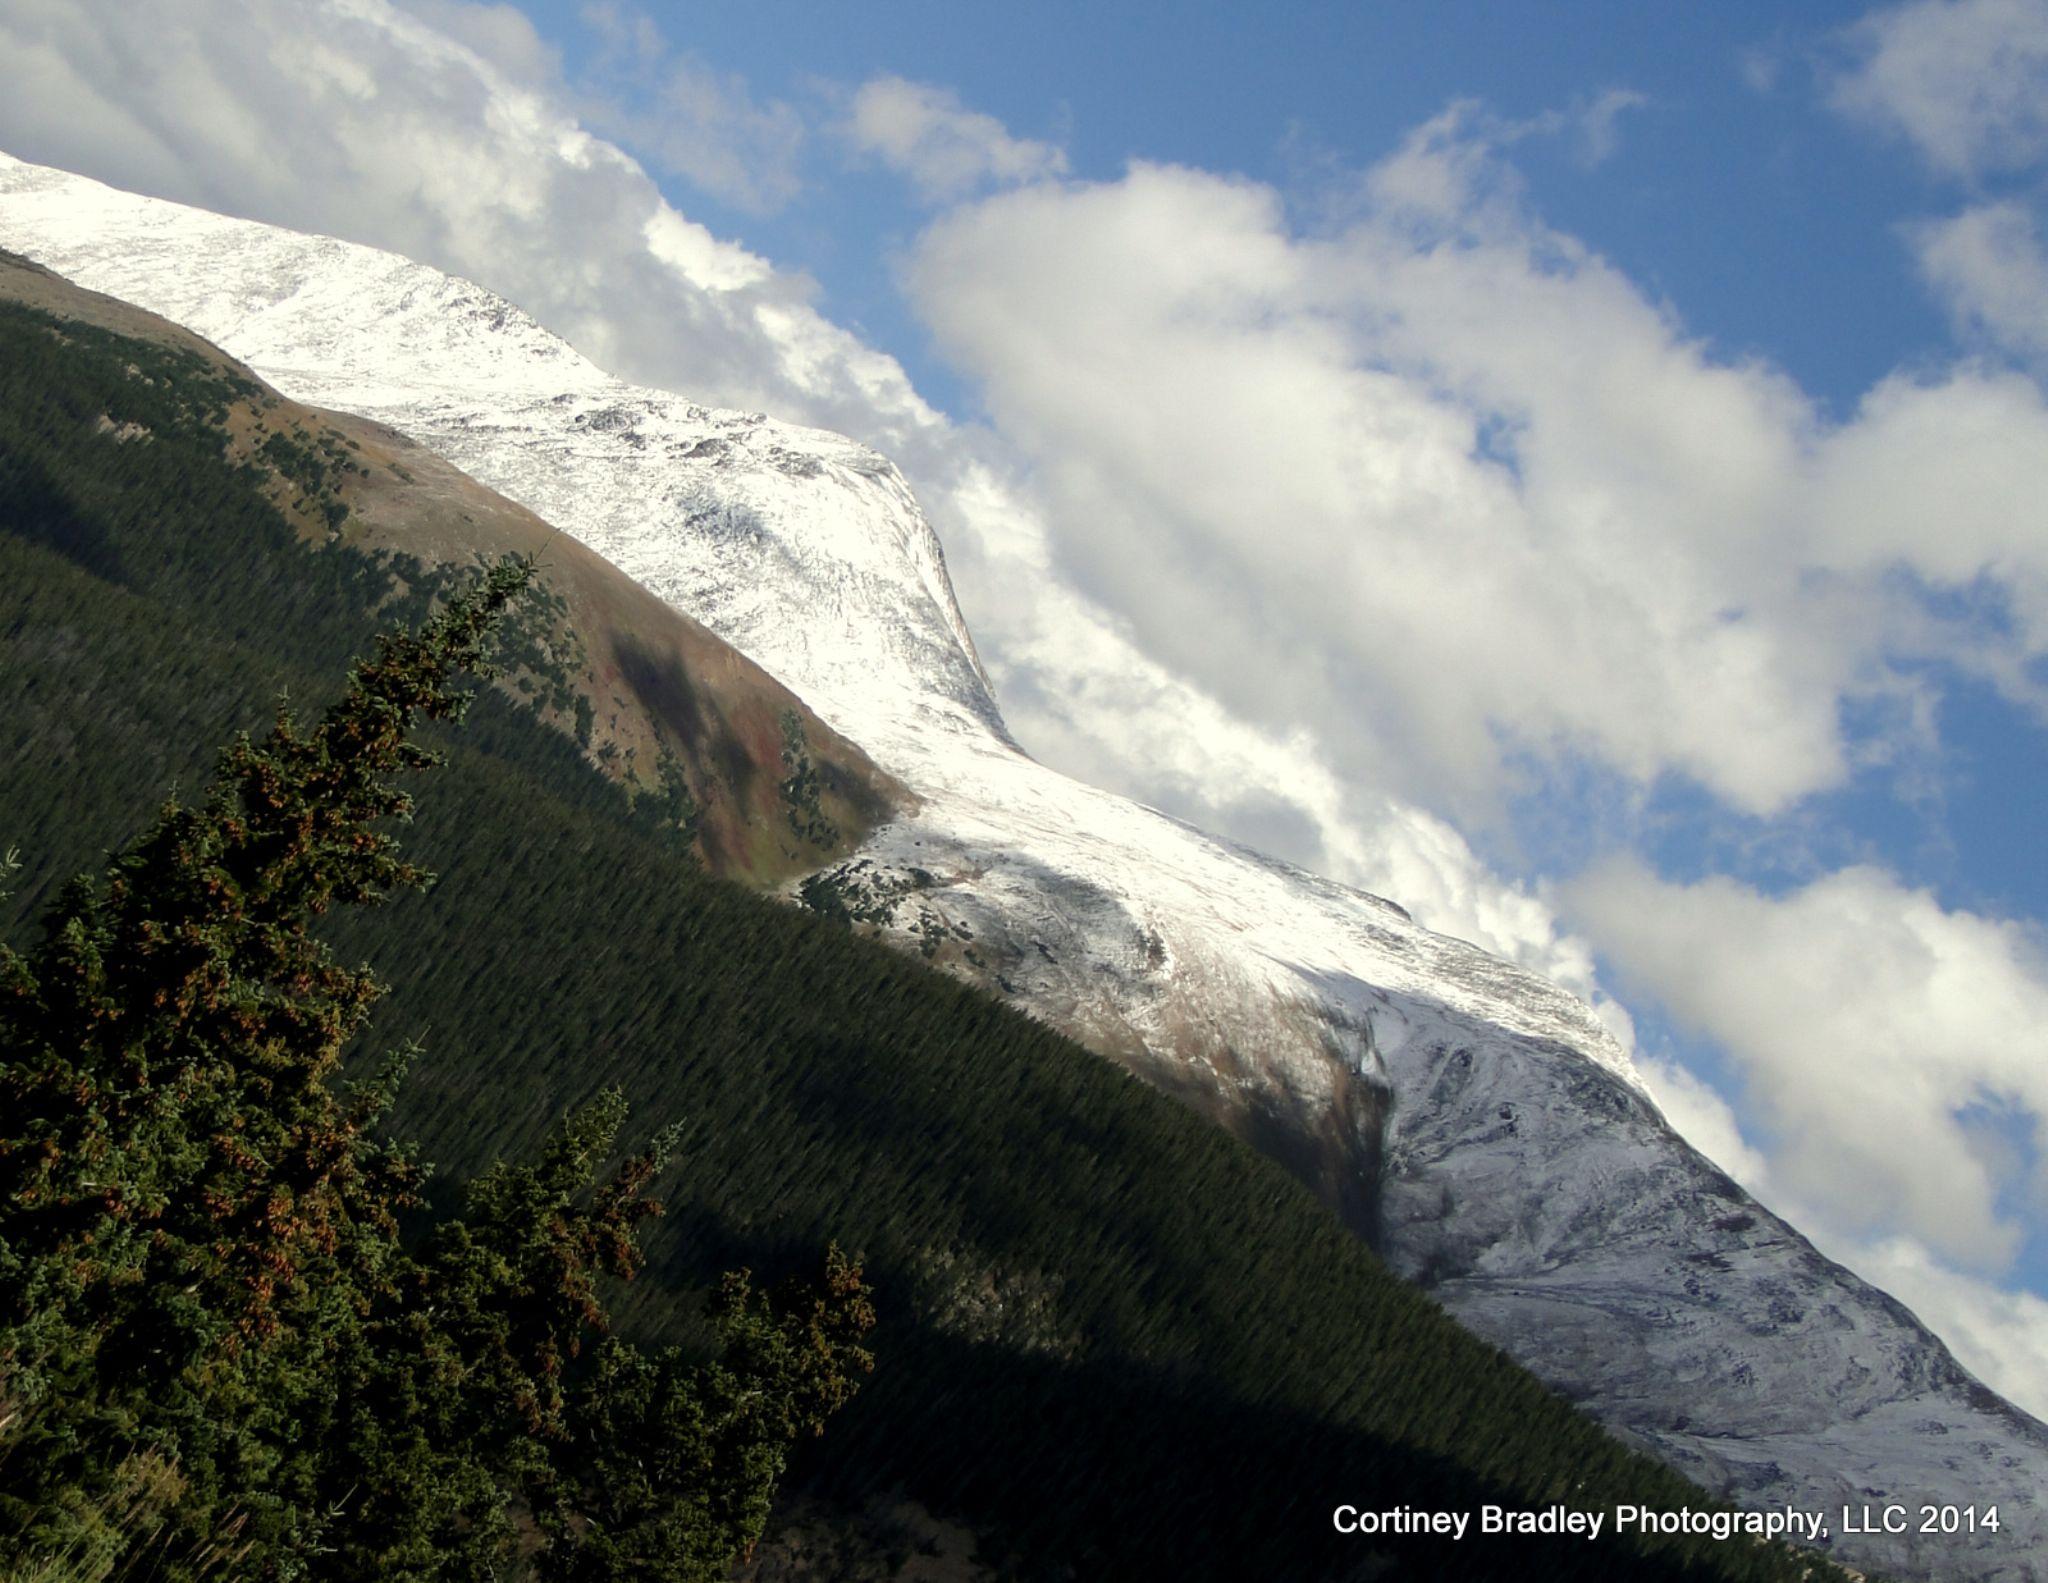 Season's First Snowfall by cortineybradleyphotography